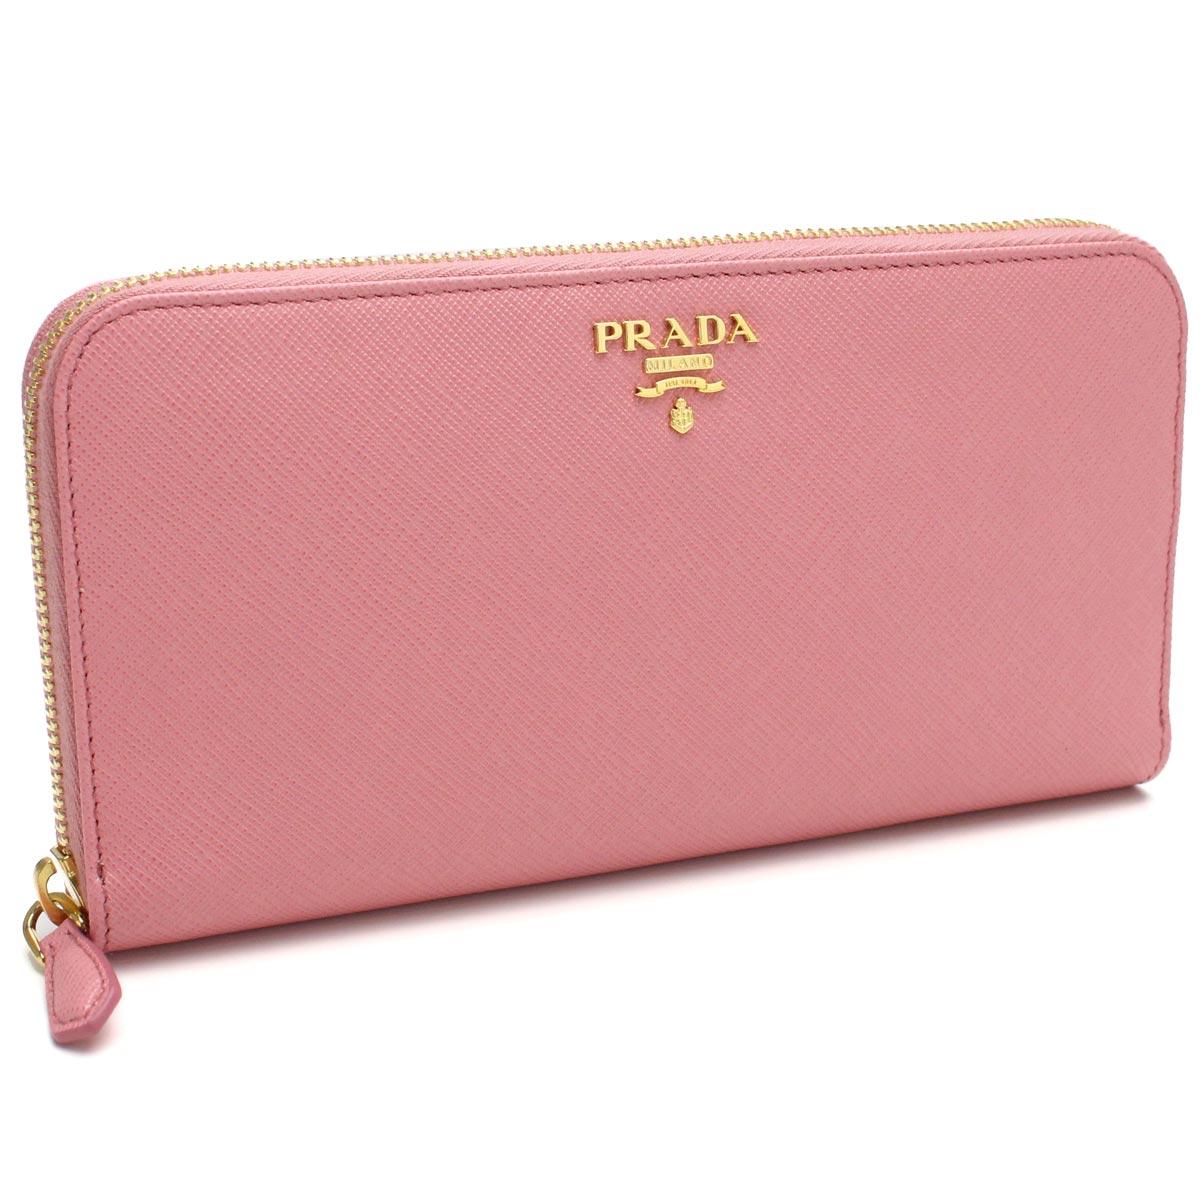 e87c28ddc0c Bighit The total brand wholesale  Prada (PRADA) round fastener long wallet  1ML506 QWA F0442 PETALO pink system